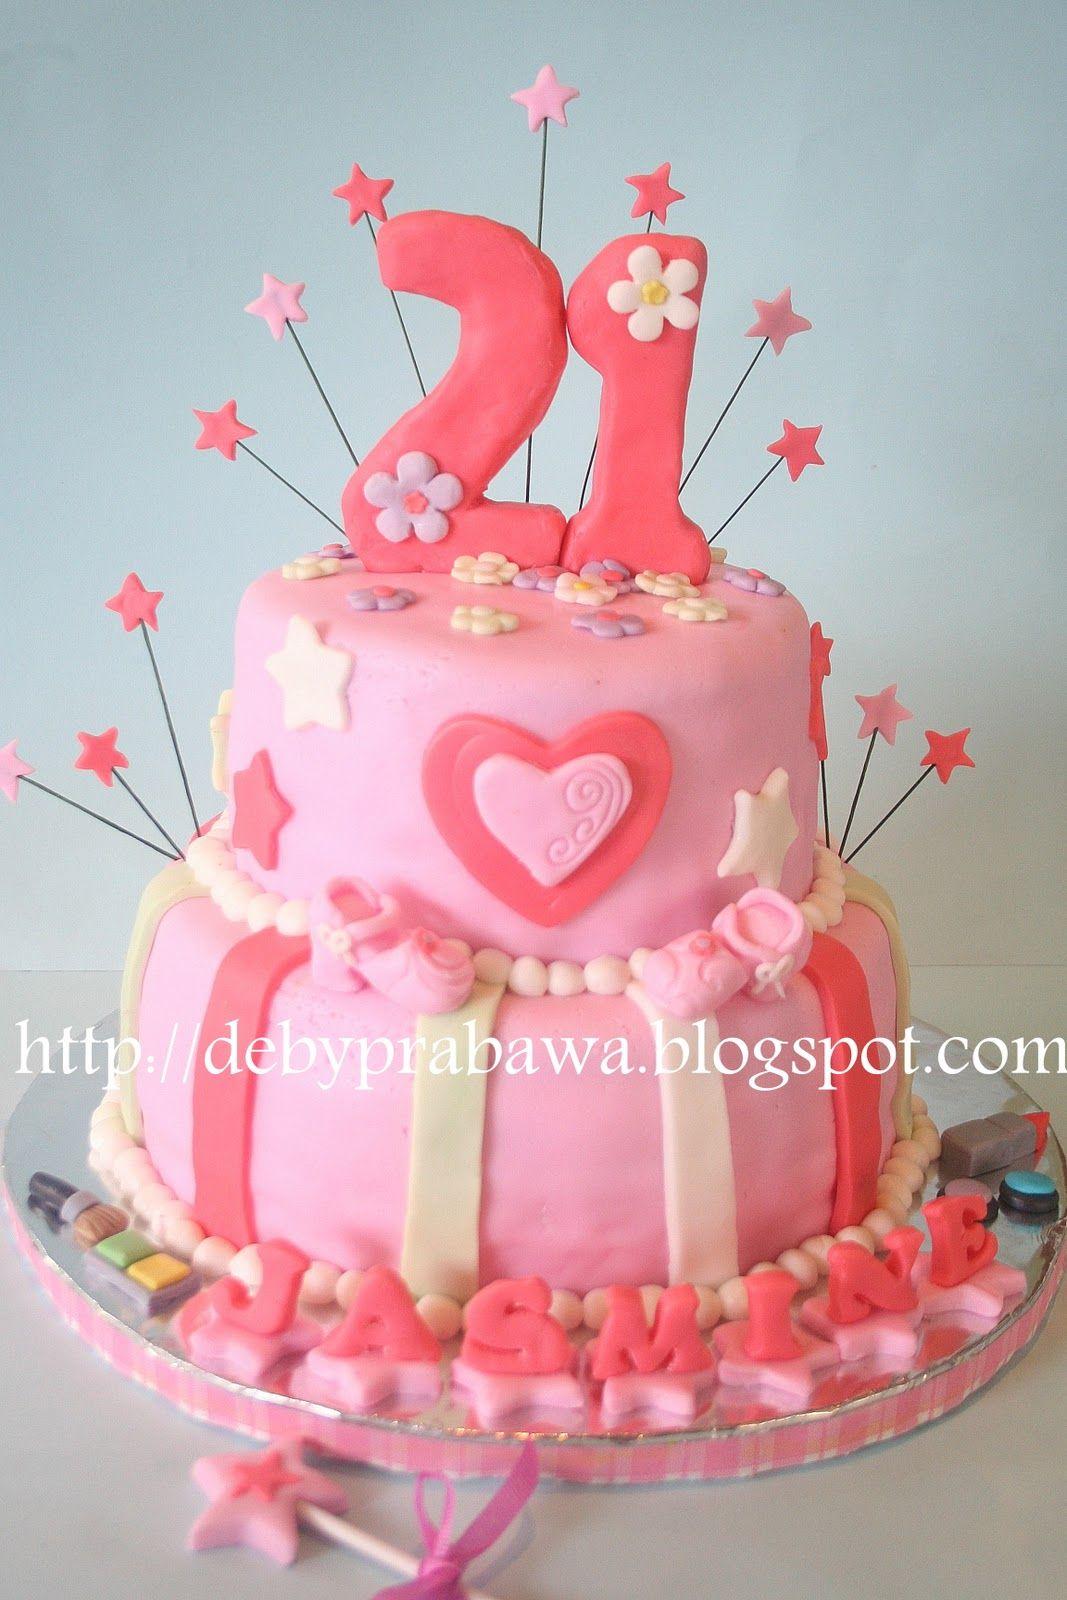 Pleasing 21St Birthday Cake For Jasmine With Images 21St Birthday Cakes Personalised Birthday Cards Cominlily Jamesorg